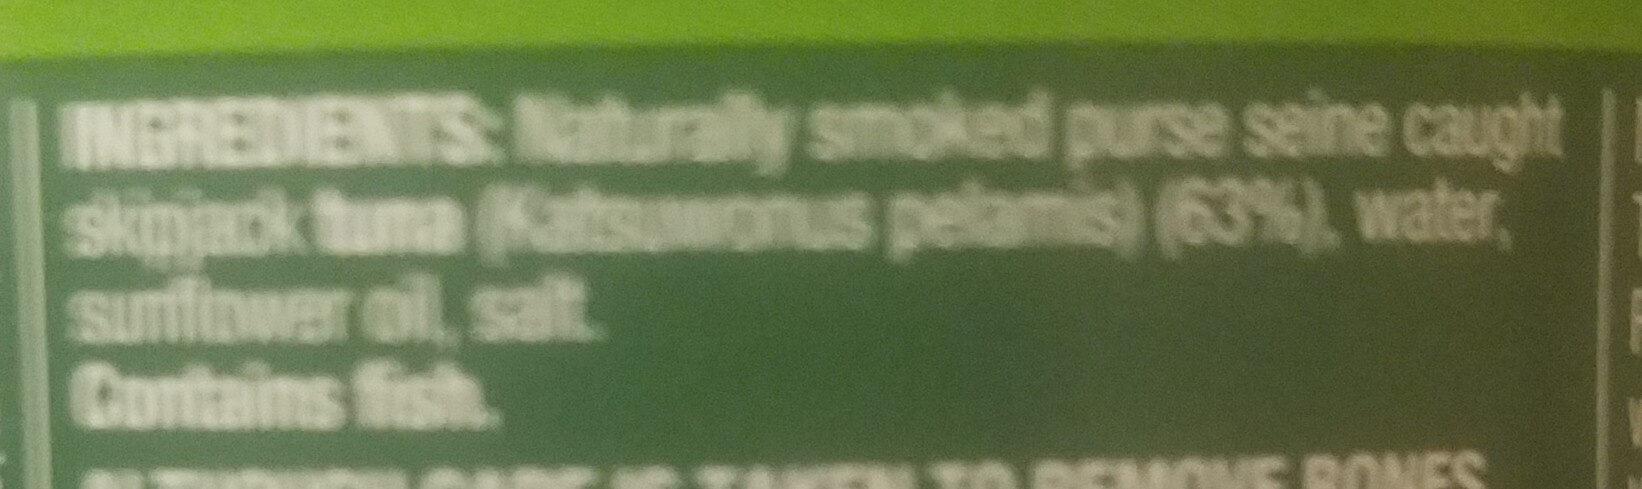 Tuna Tempters - Naturally Smoked - Ingredients - en